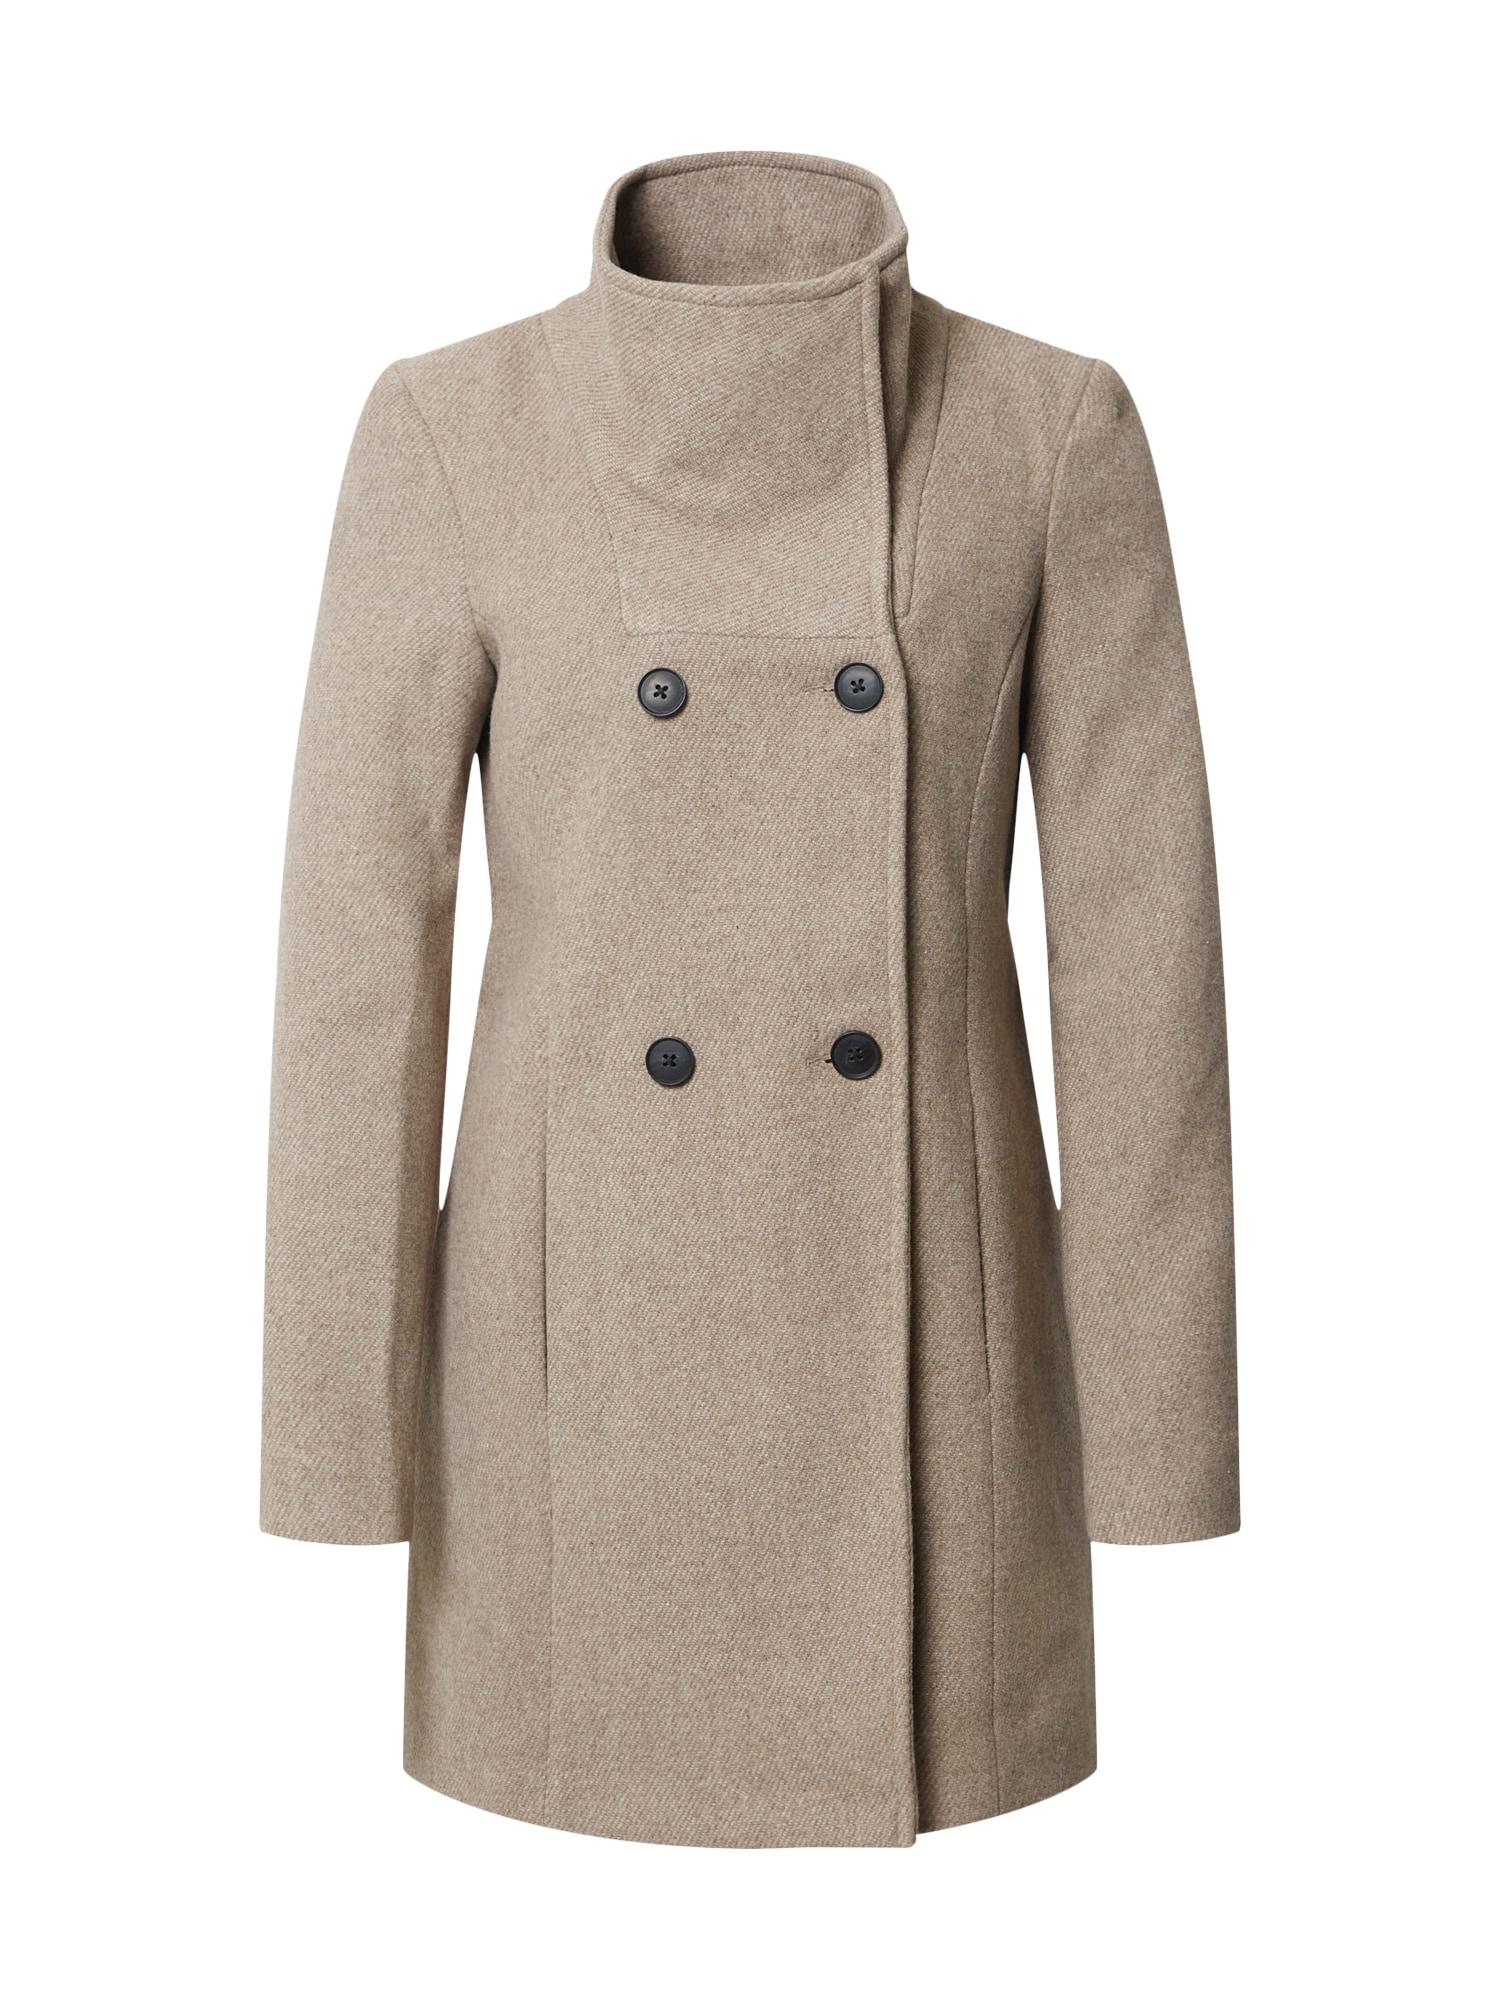 VERO MODA Přechodný kabát 'Classline'  hnědý melír